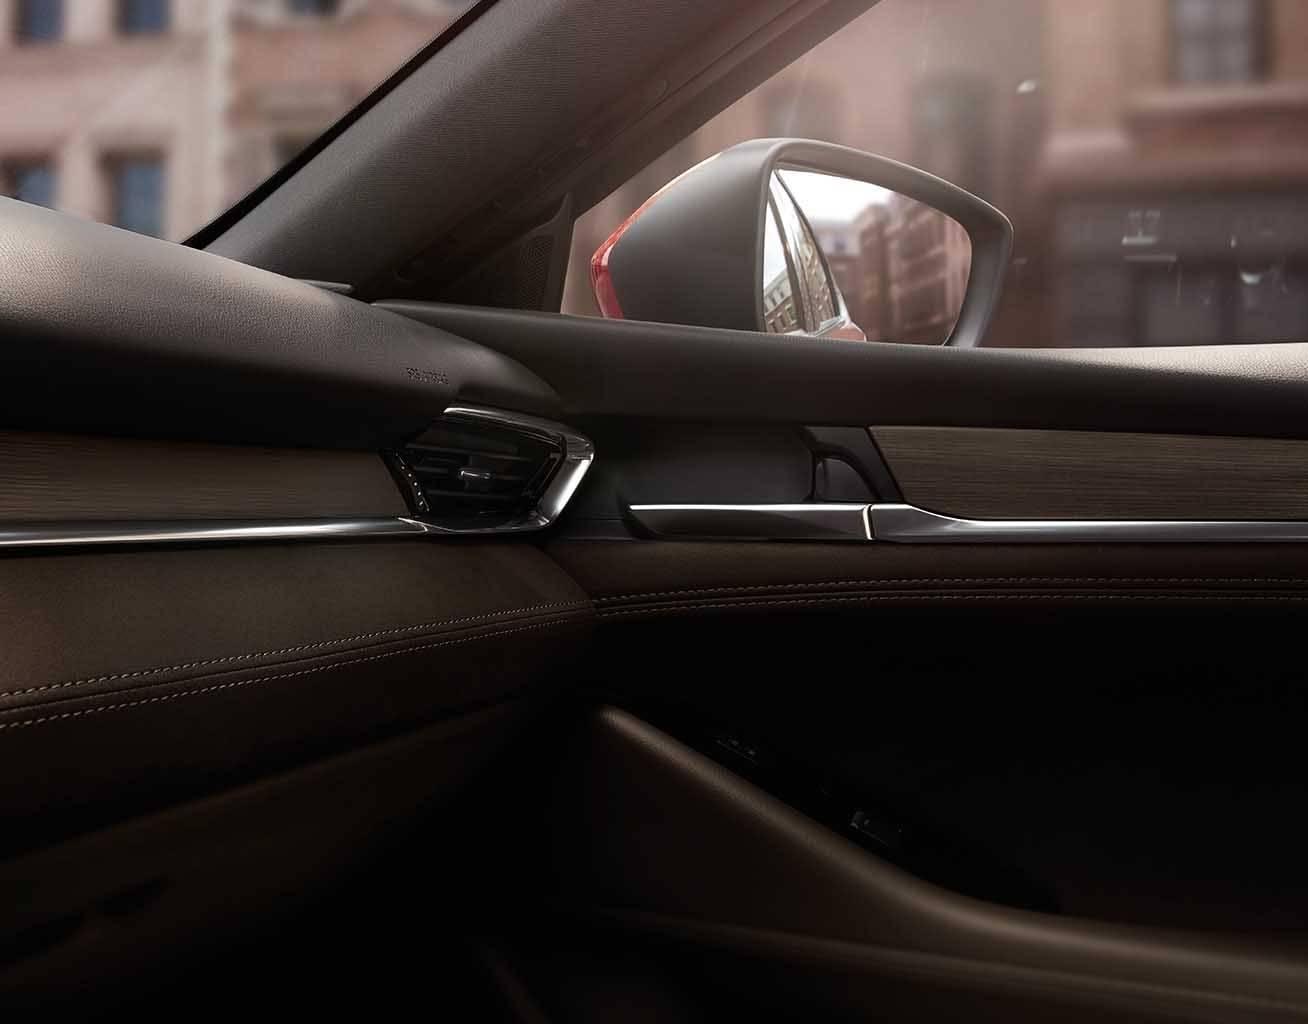 2018 Mazda6, THE SOUND OF SCIENCE